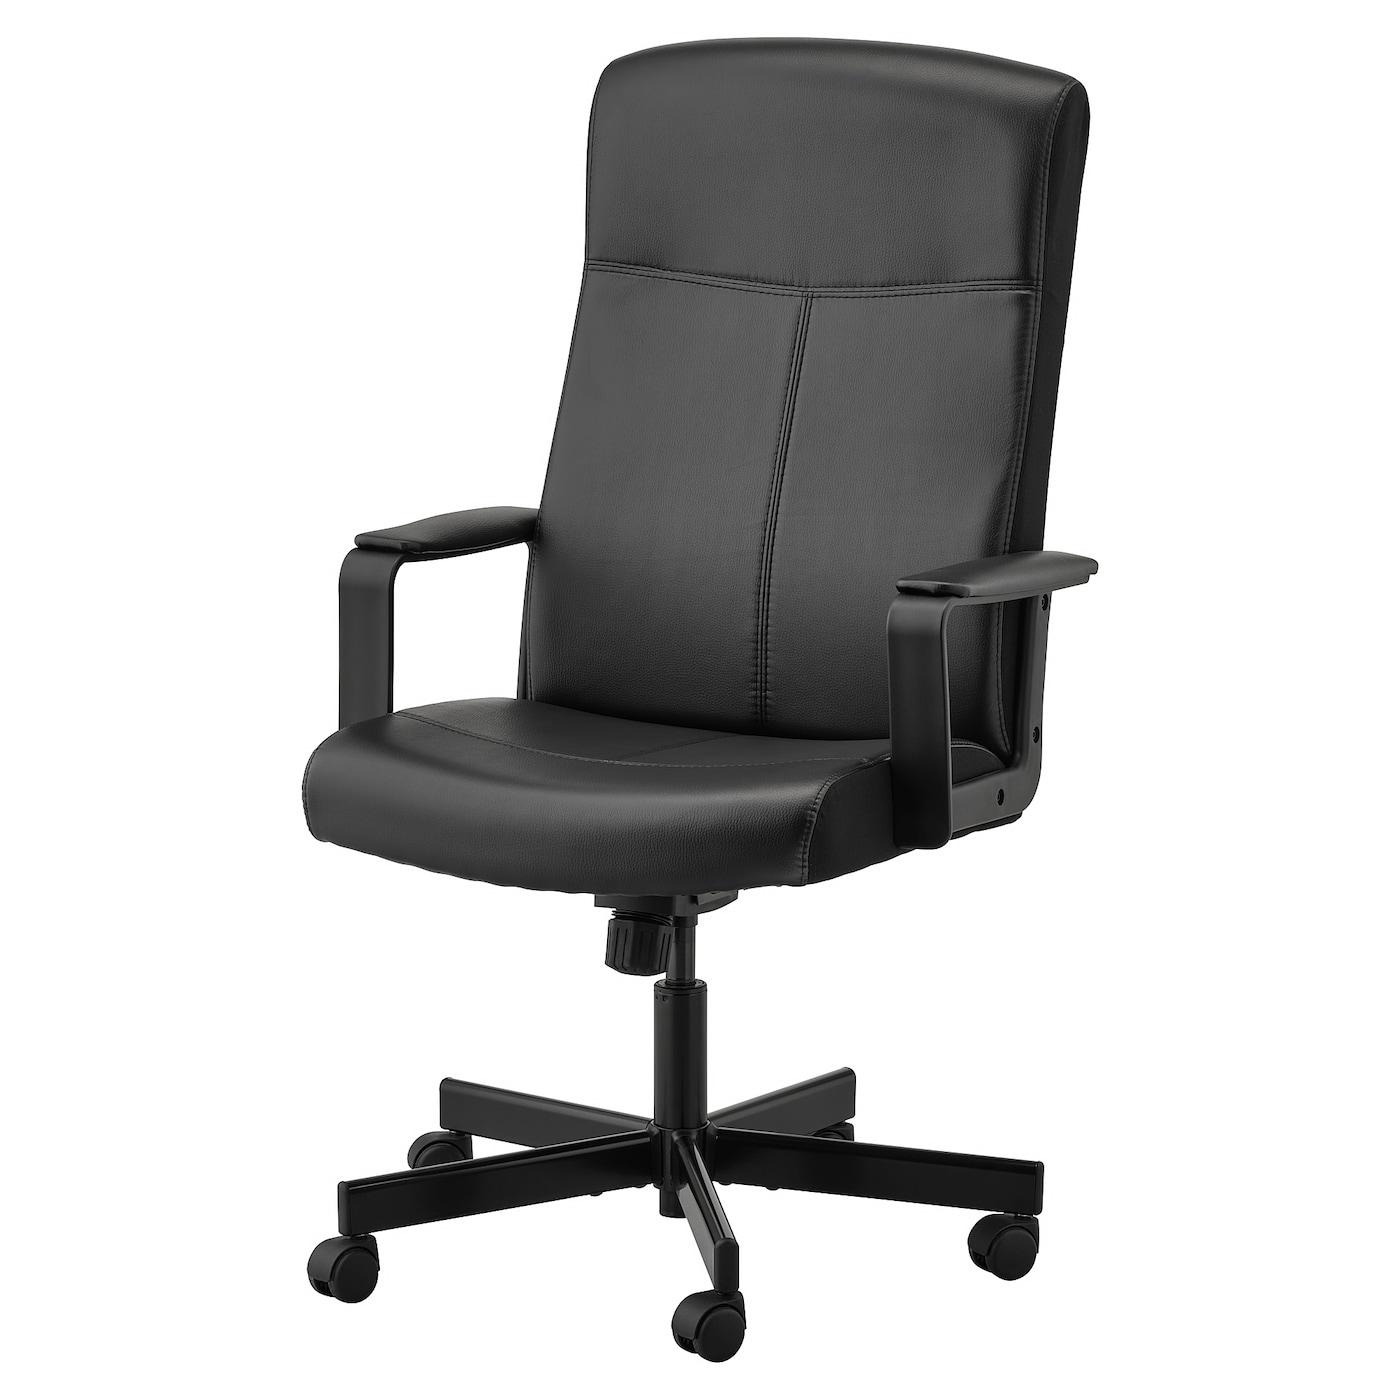 MILLBERGET Swivel chair - Bomstad black